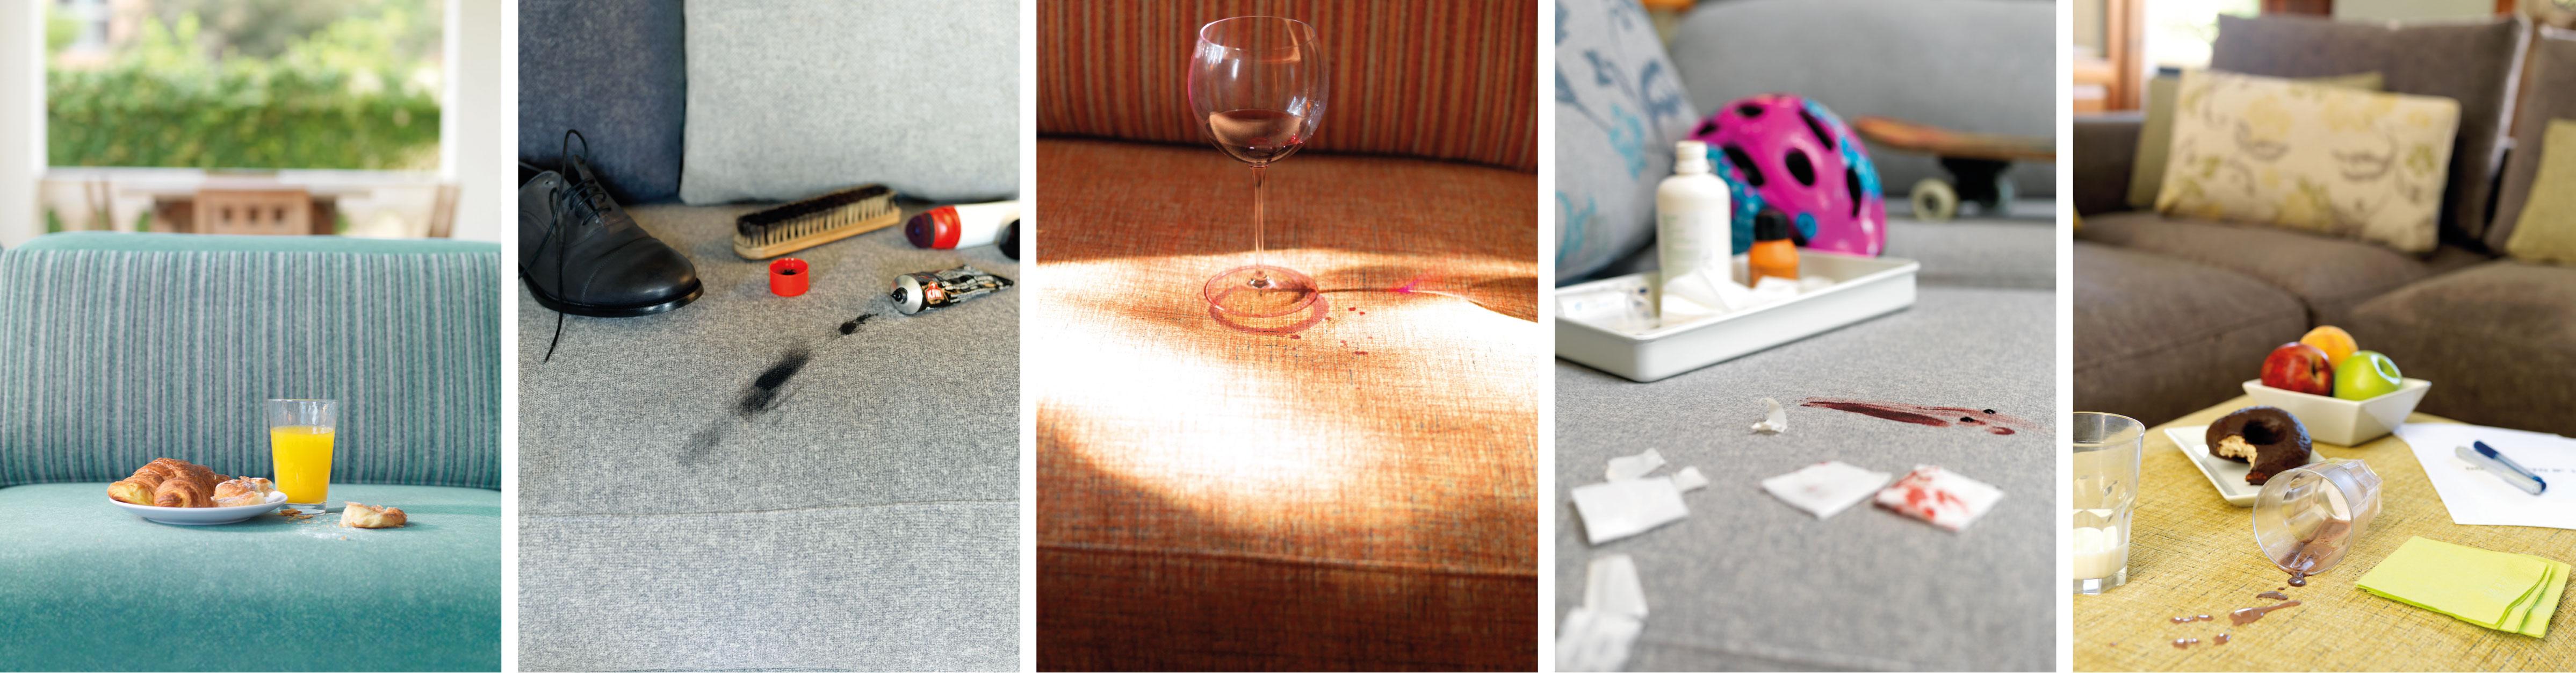 Family Friendly Standard Aquaclean Fabrics   A lot of life happens on your sofa